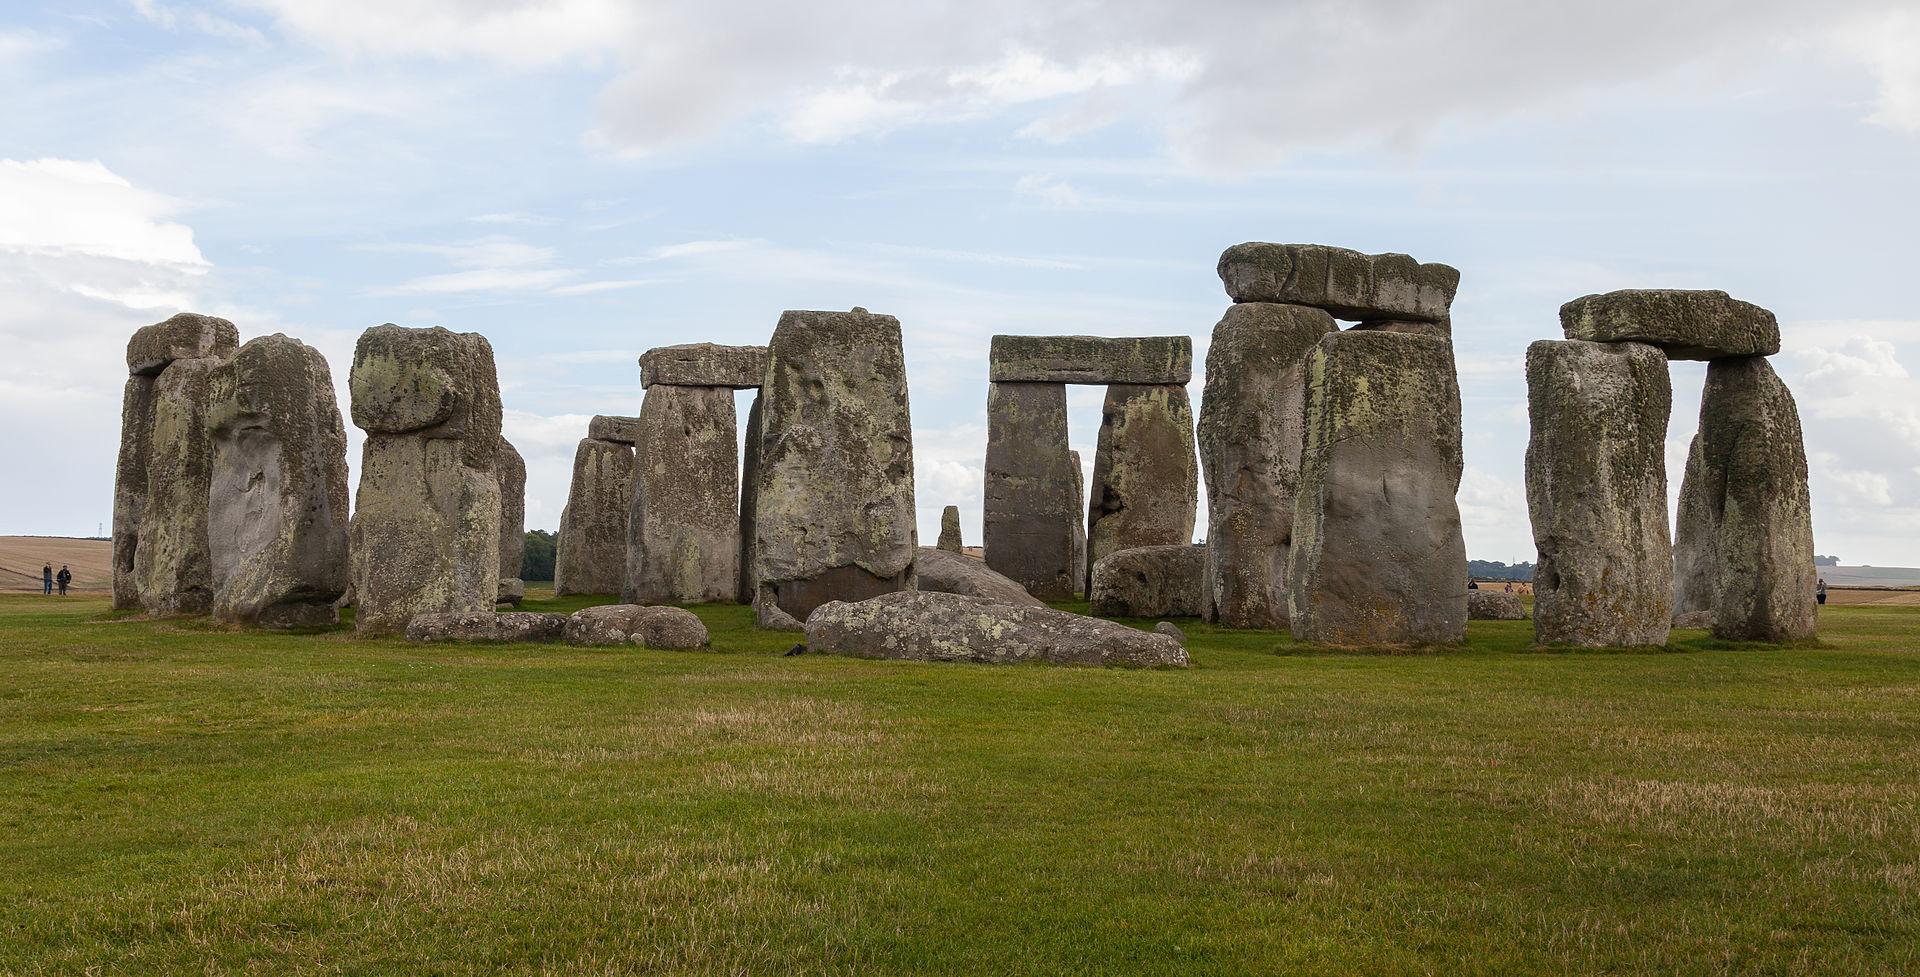 https://upload.wikimedia.org/wikipedia/commons/thumb/a/a3/Stonehenge%2C_Condado_de_Wiltshire%2C_Inglaterra%2C_2014-08-12%2C_DD_02.JPG/1920px-Stonehenge%2C_Condado_de_Wiltshire%2C_Inglaterra%2C_2014-08-12%2C_DD_02.JPG